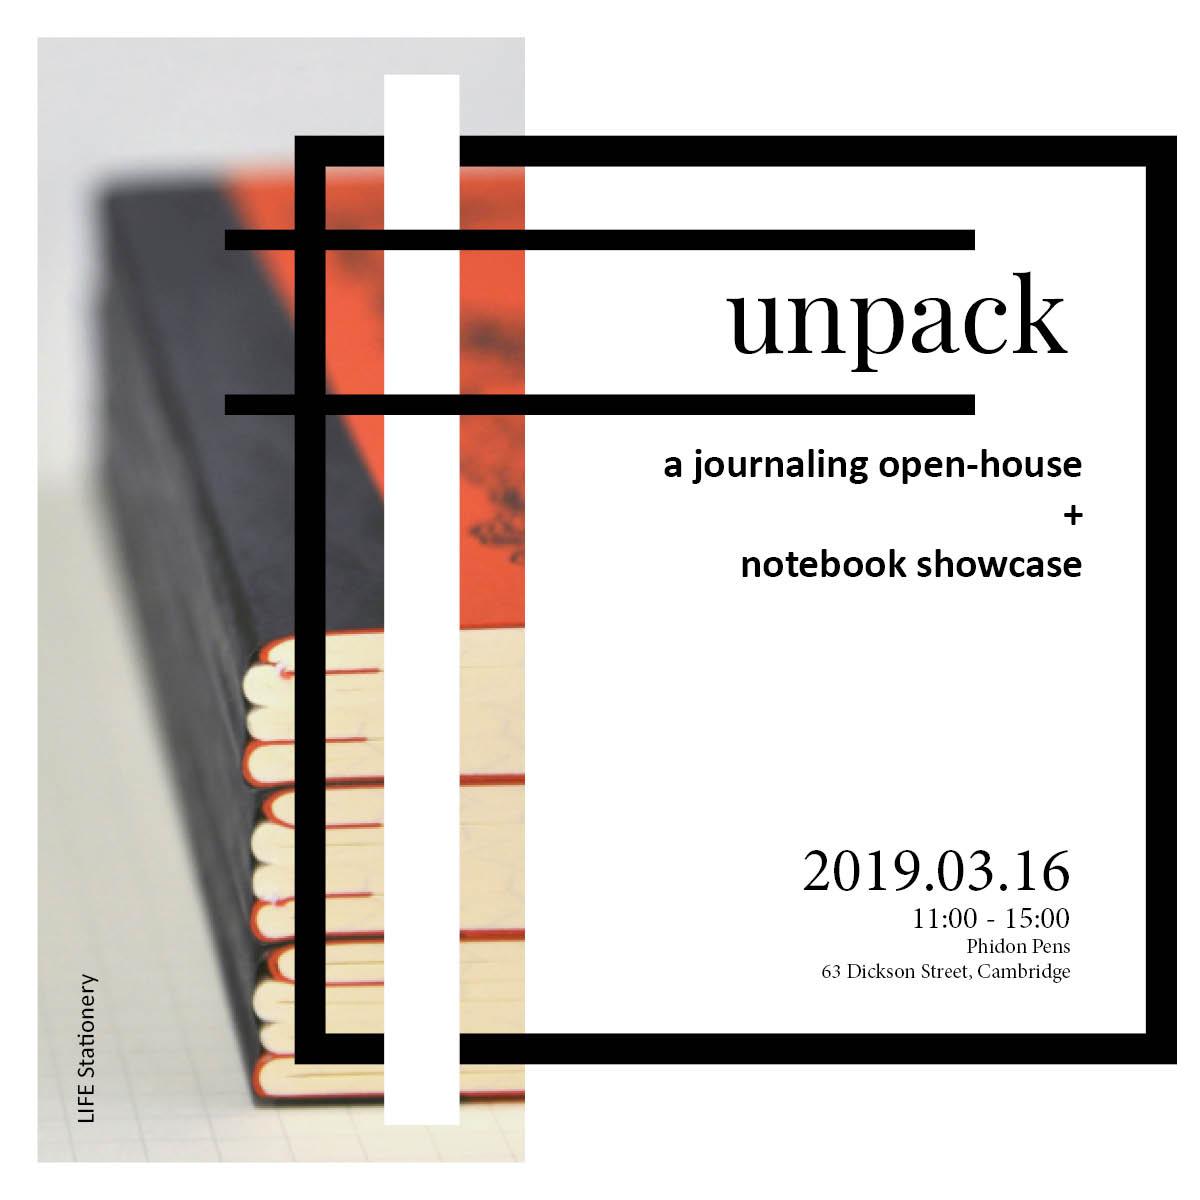 Unpack 01.jpg